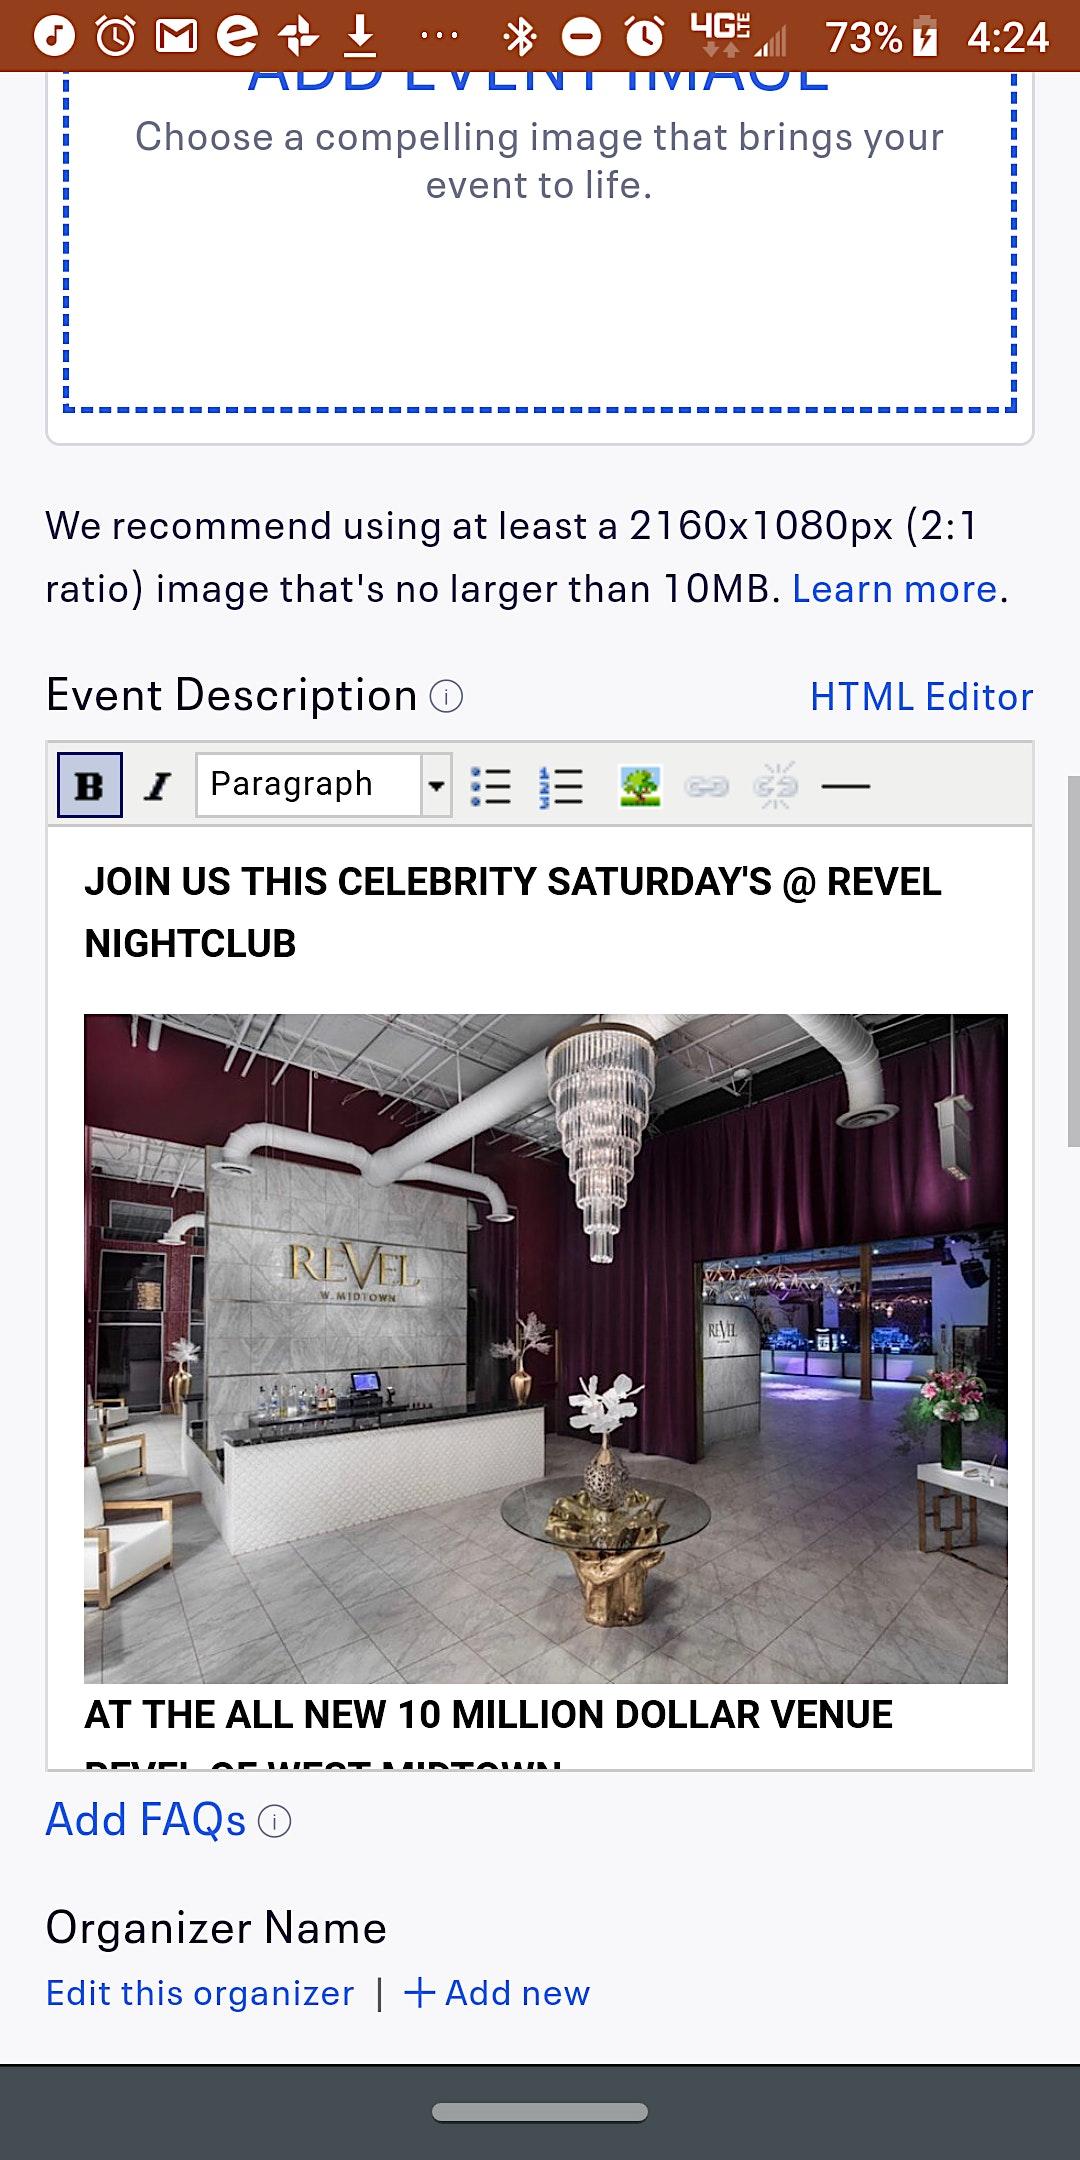 ATL's #1 Saturday Night Party! Celebrity Saturday's @REVEL! RSVP NOW! (SWIRL)